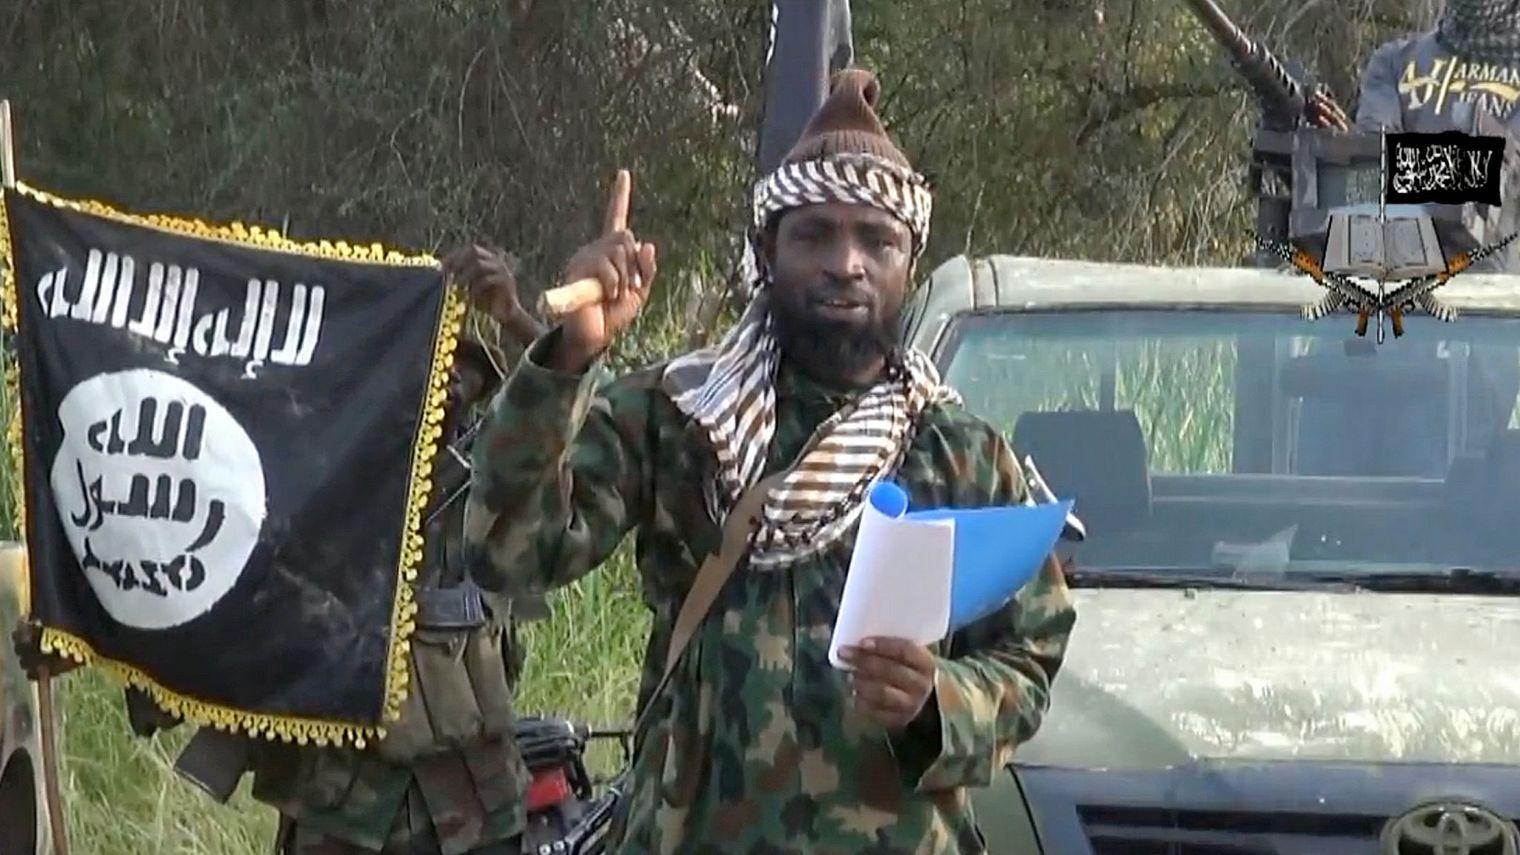 Le leader de Boko Haram Shekau refait surface